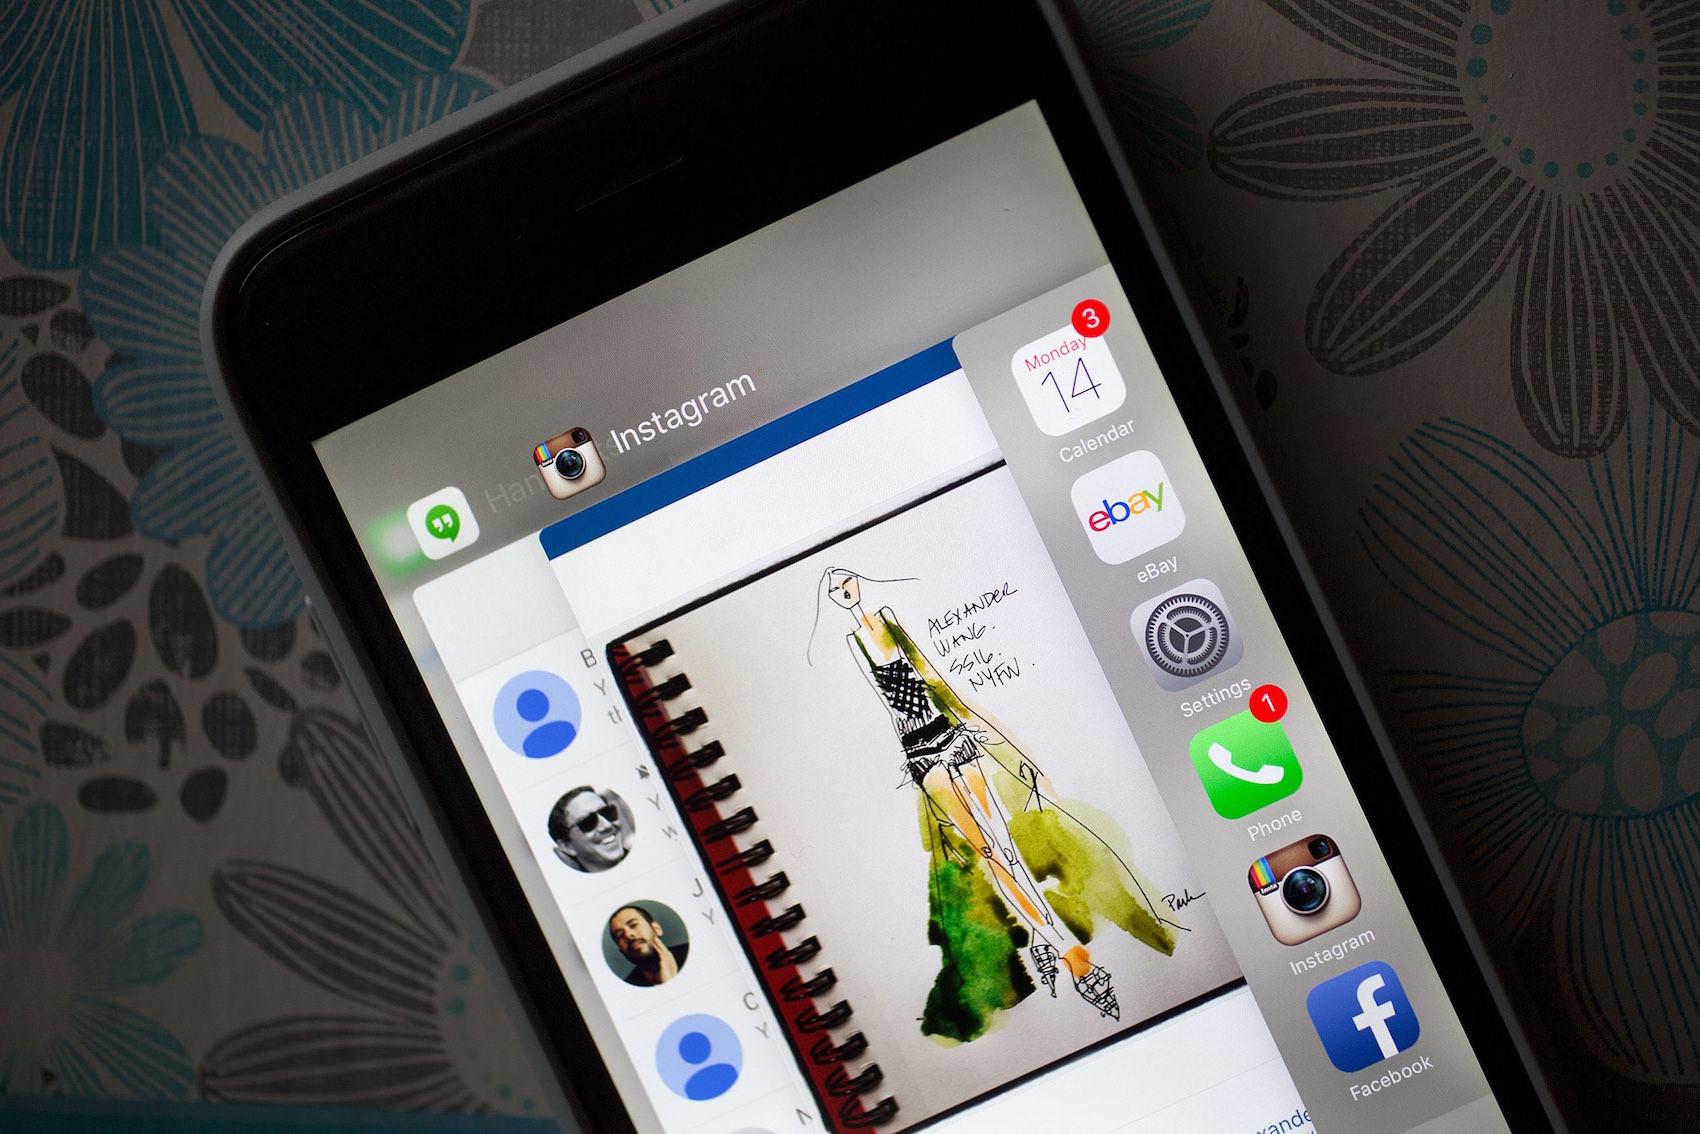 iOS 9.1, iOS 9.2, iOS 9.2.1 и iOS 9.3 beta Jailbreak Cydia Download Hack Crack Tweaks Russia 34